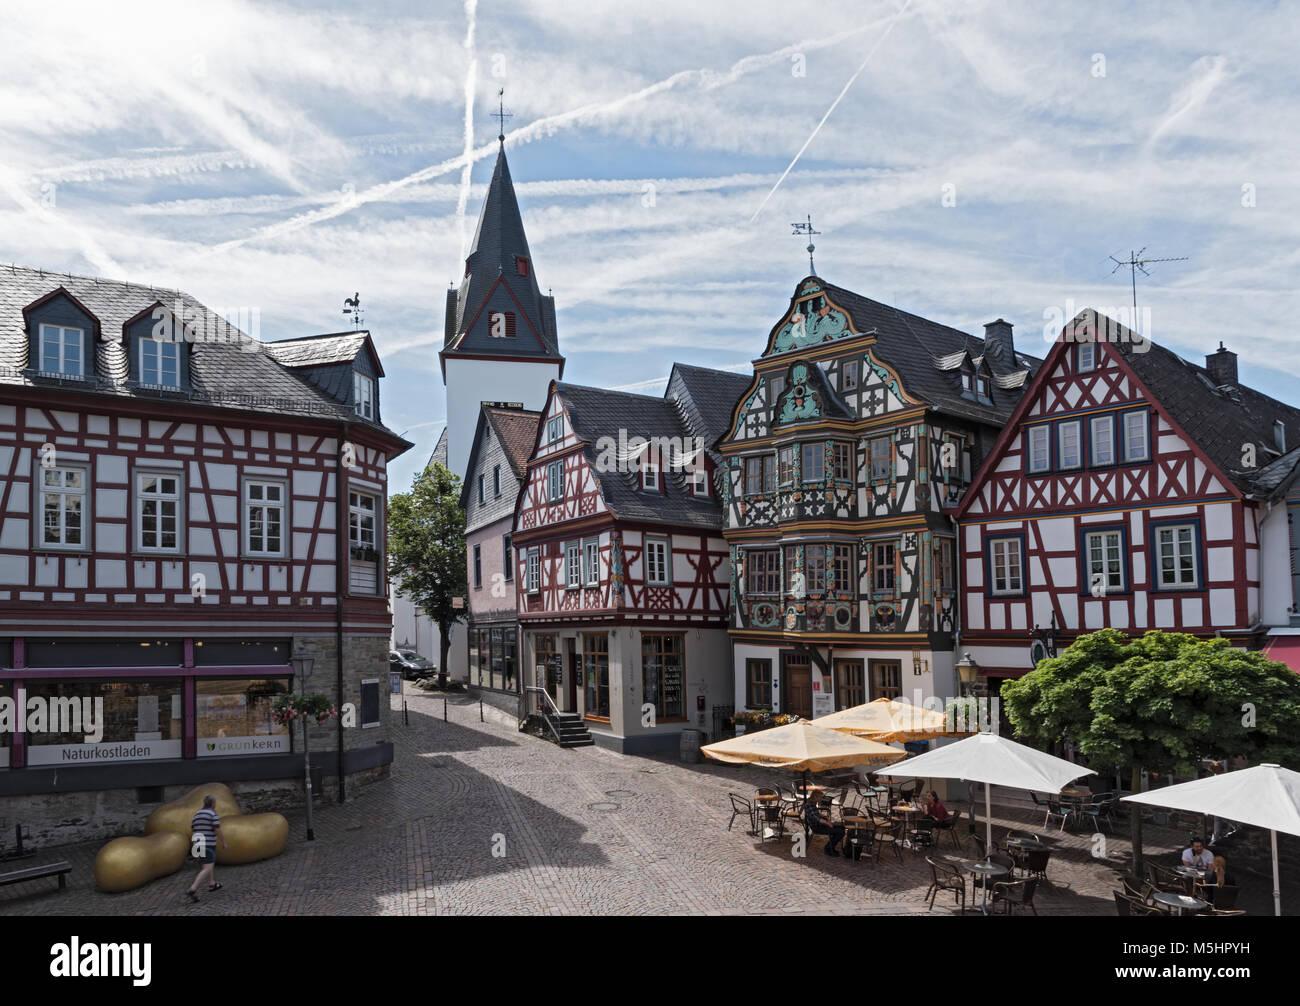 View of the Koenig-Adolf-Platz, Idstein, Hesse, Germany - Stock Image